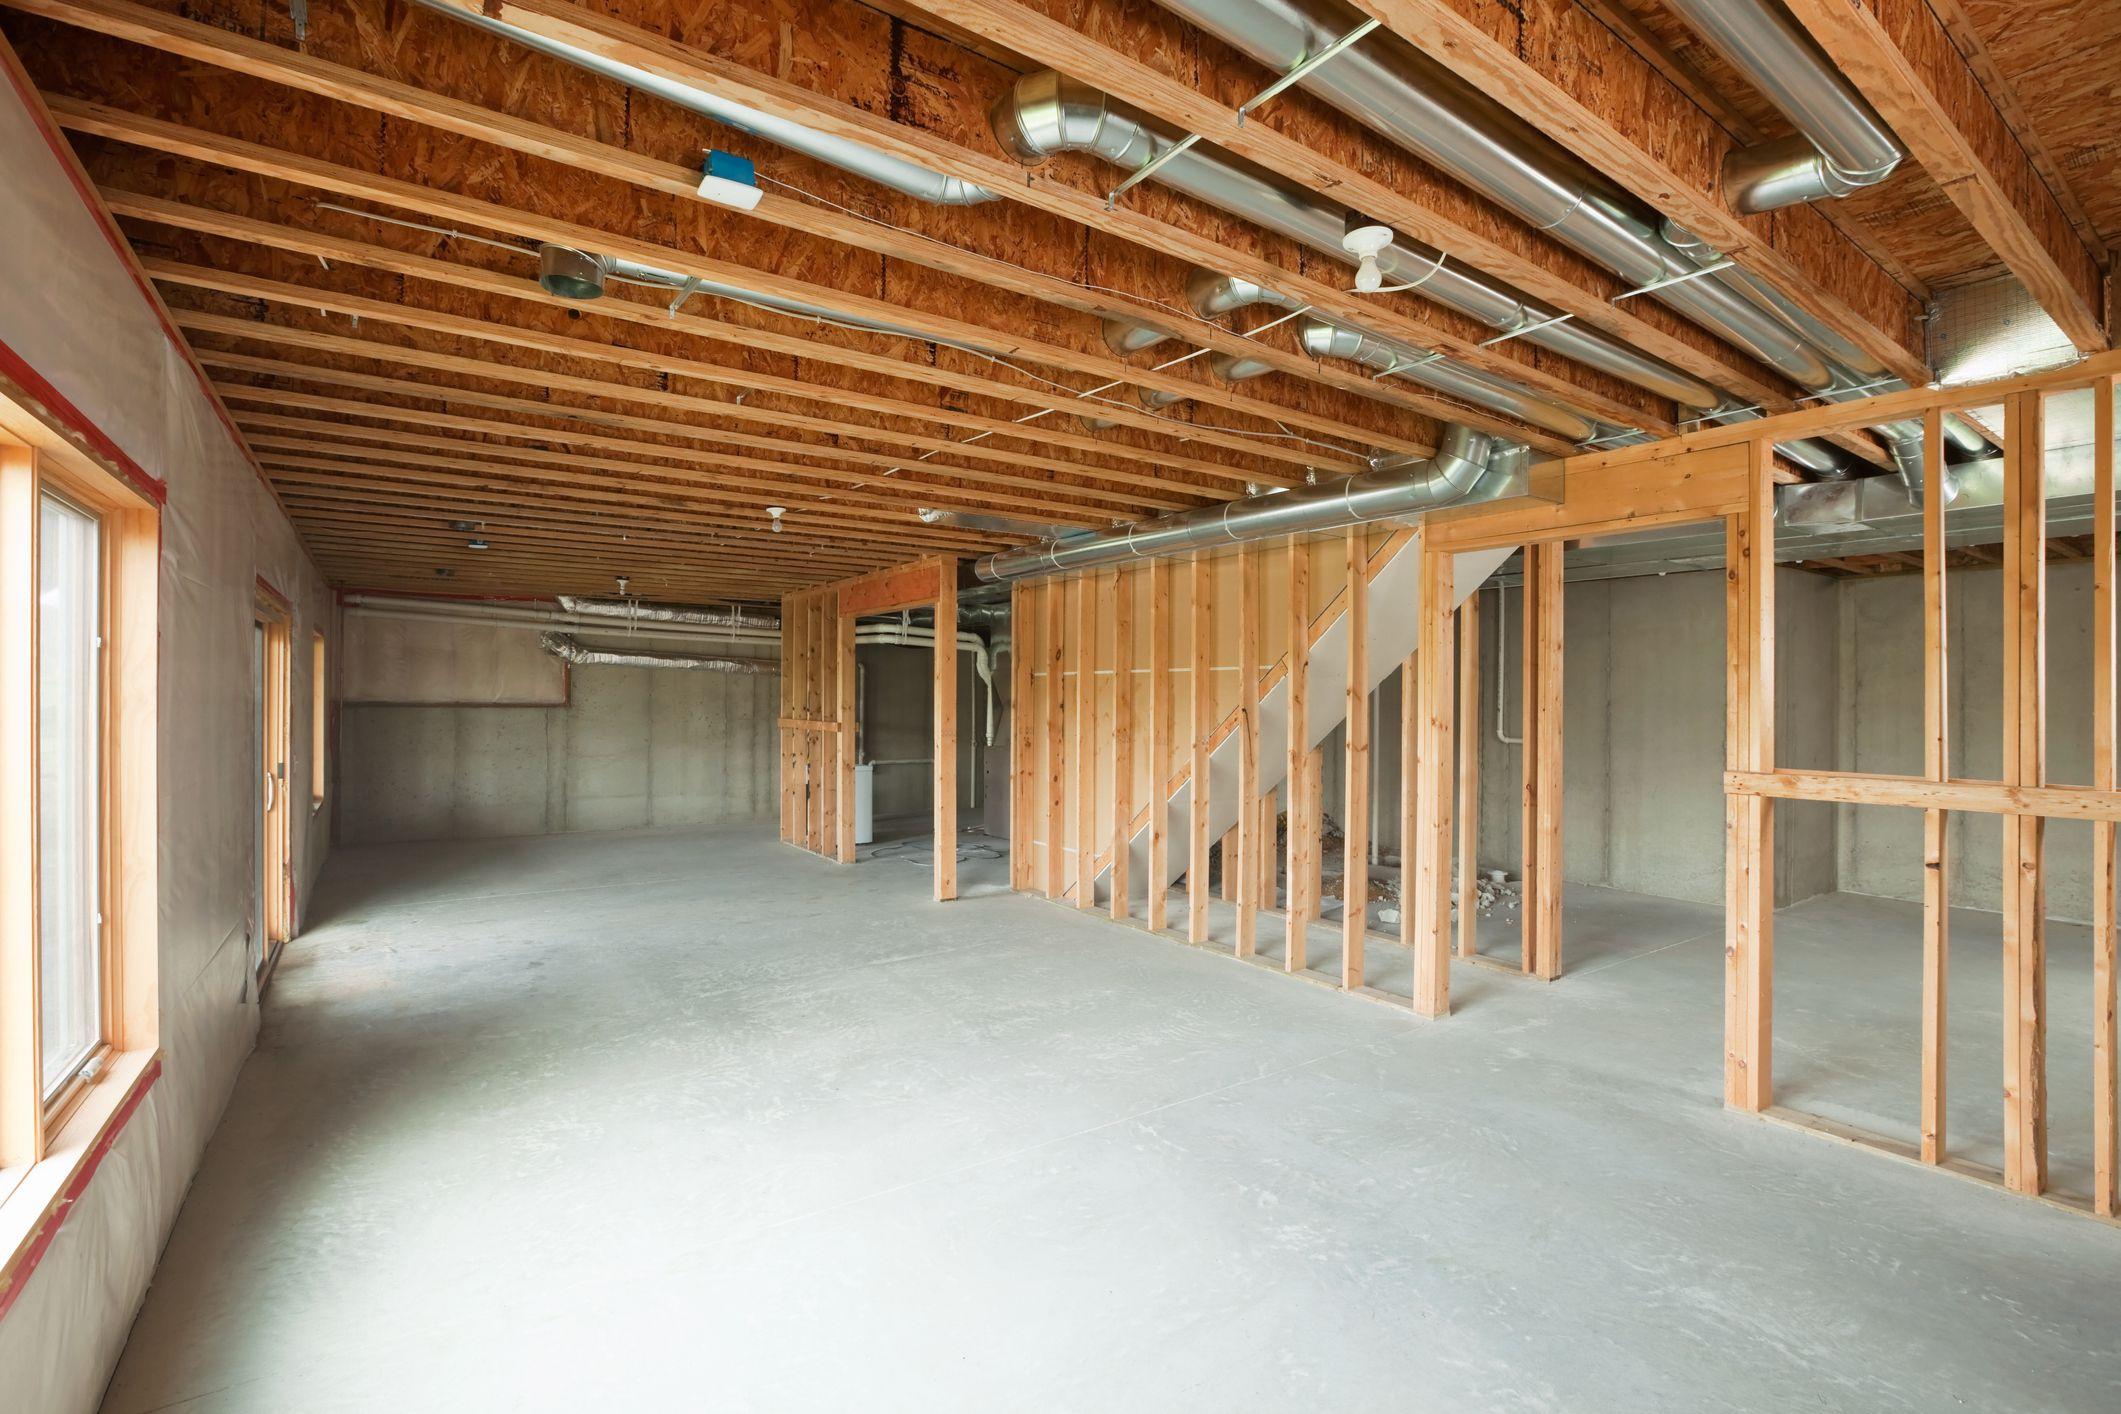 Best green flooring options for basements